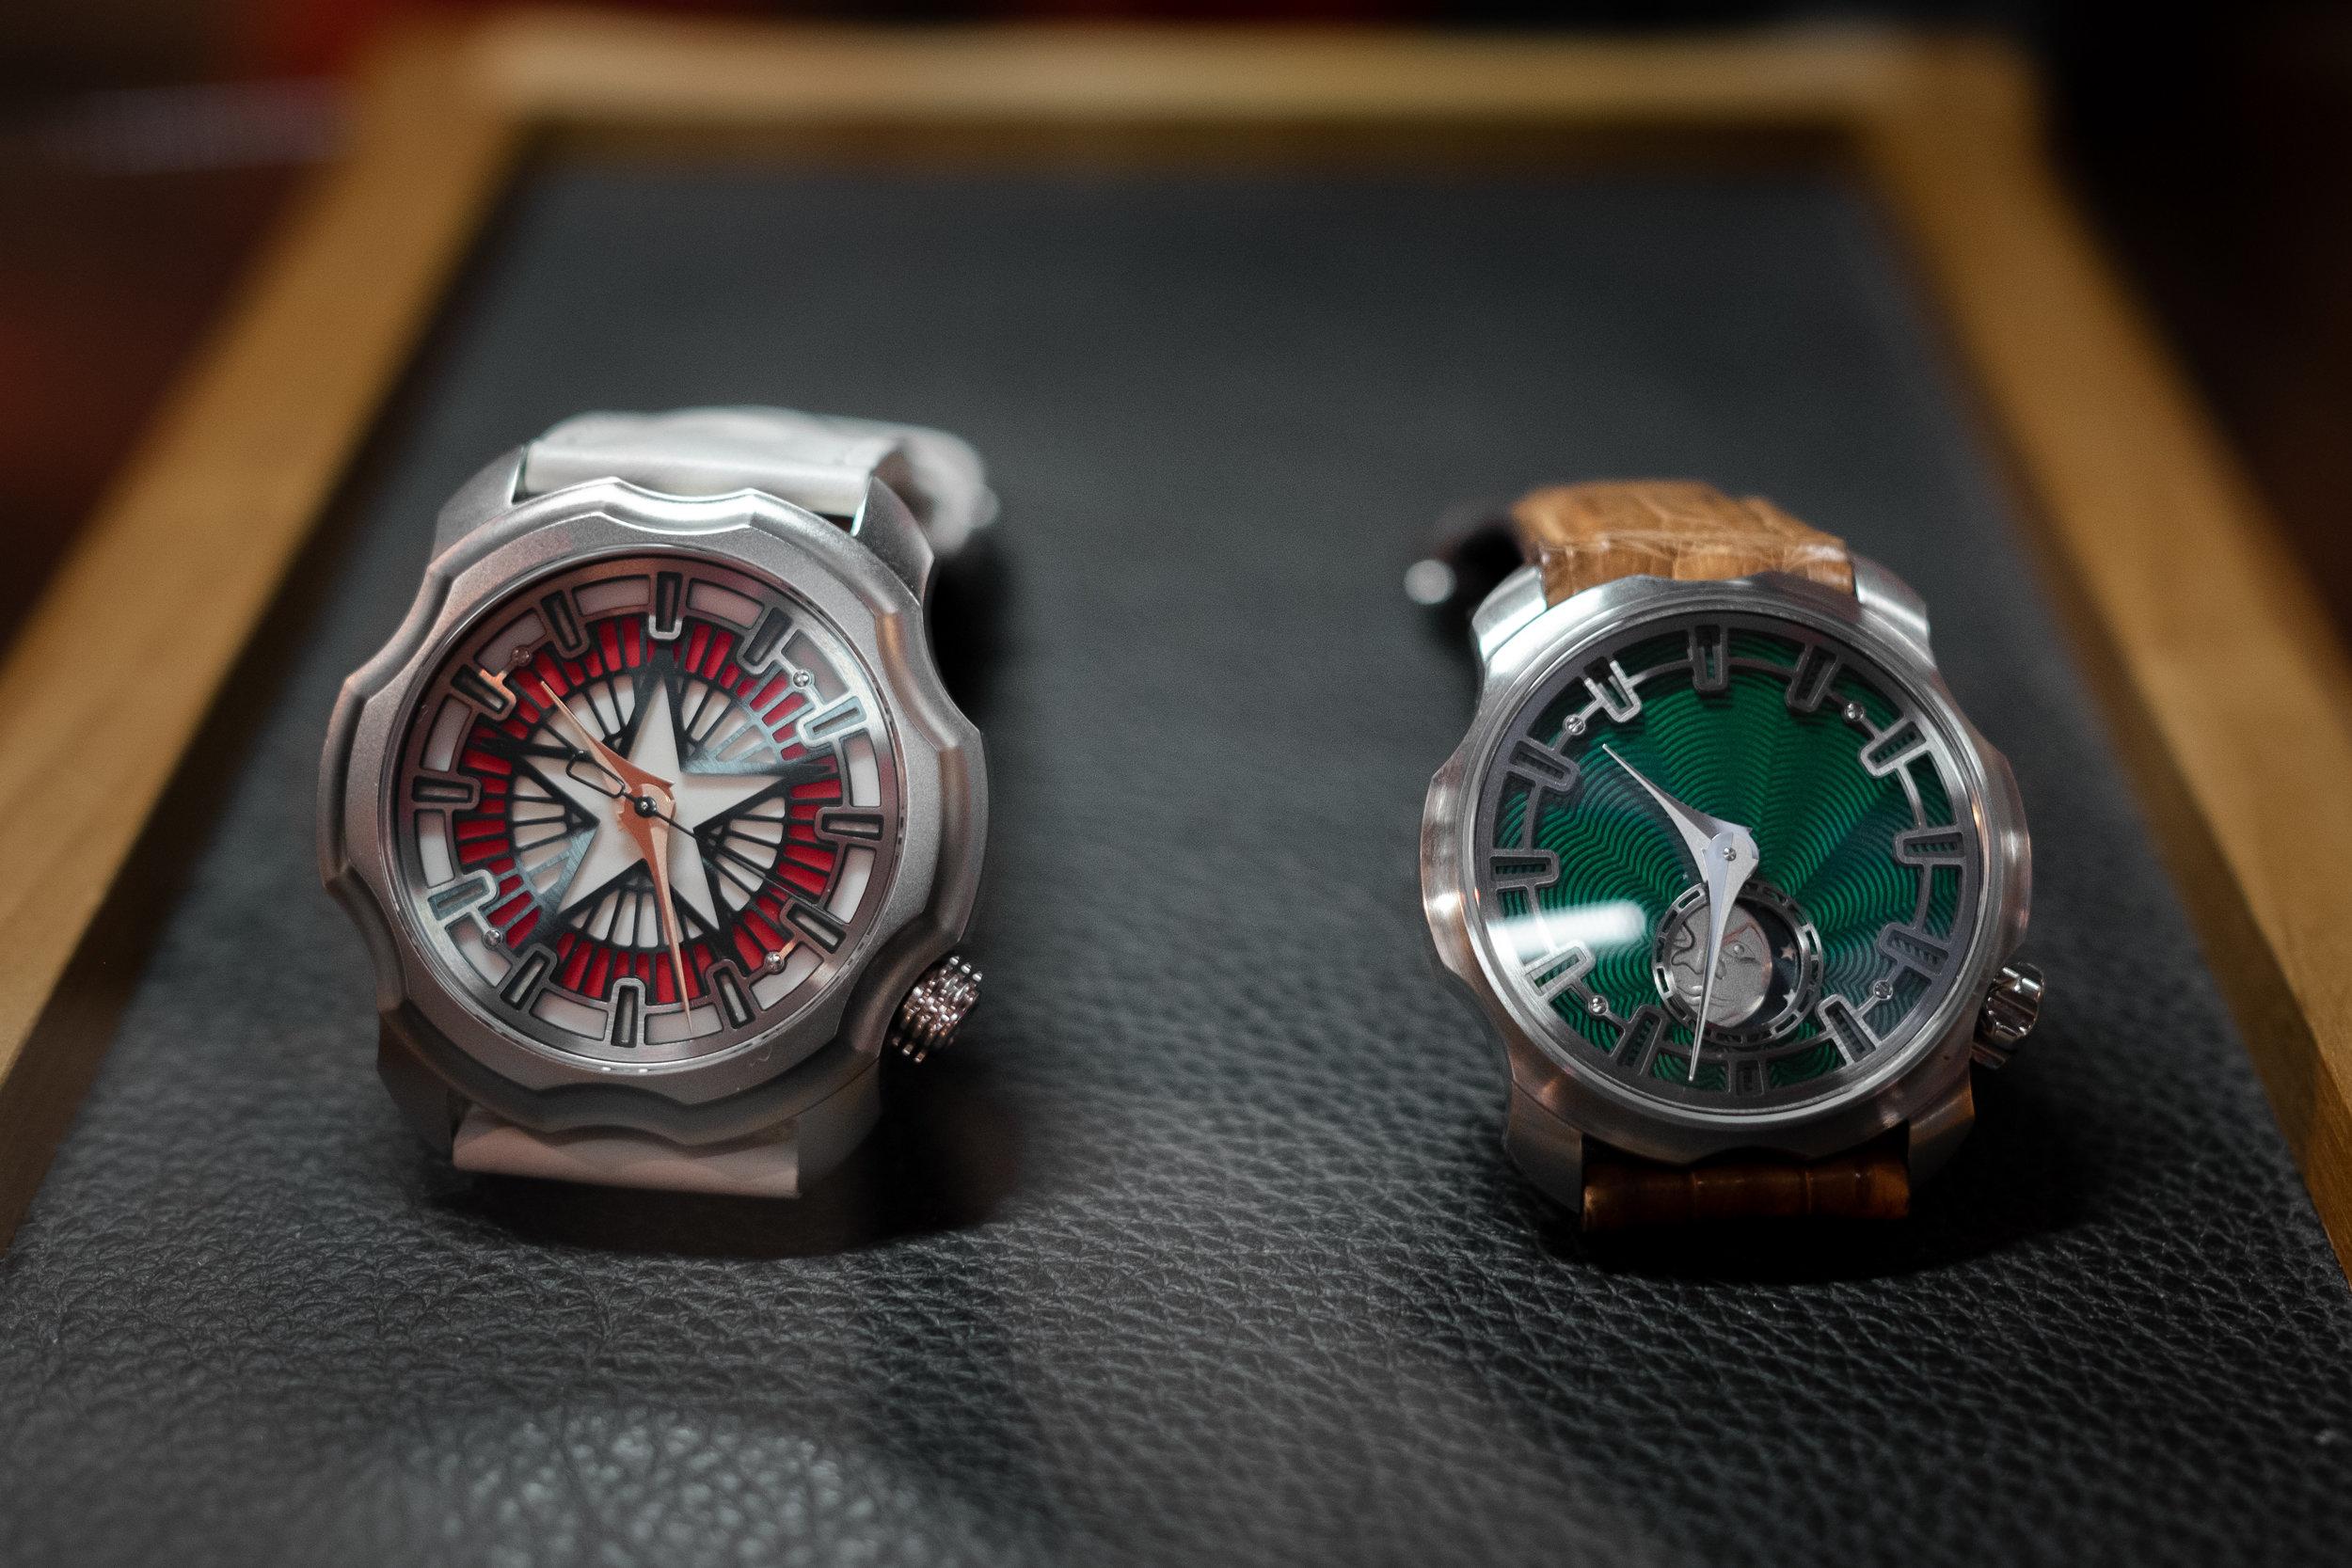 Two Sarpanevas - K0 Daredevil Dusk (left) and K0 Northern Stars (right)